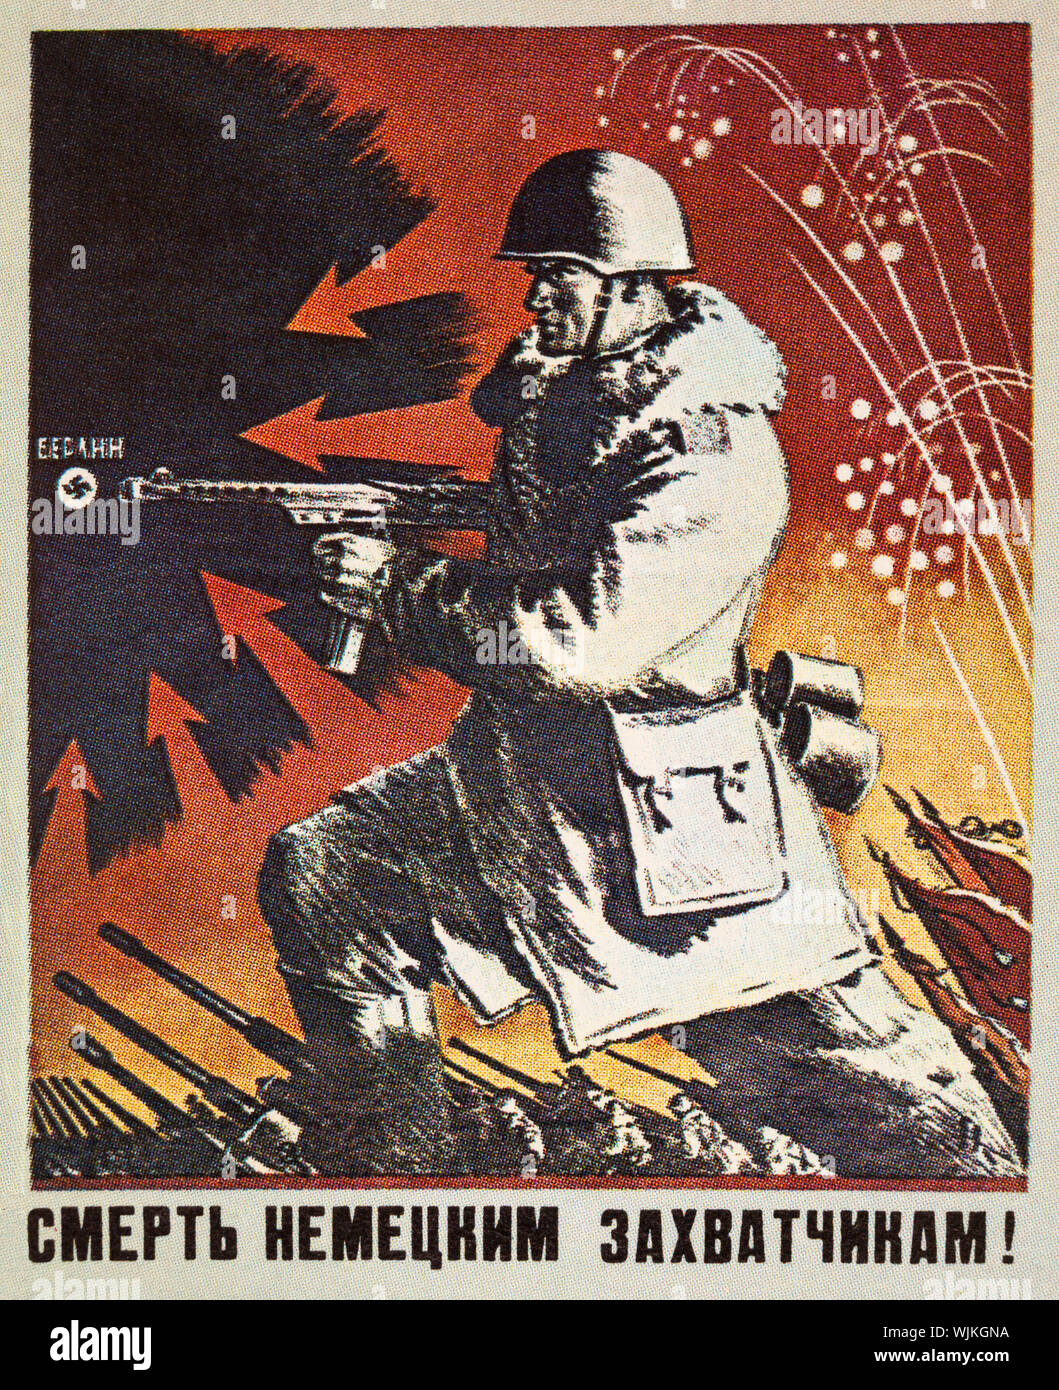 Soviet Constructivism THE DEVELOPMENT OF TRANSPORT Russian Propaganda Poster